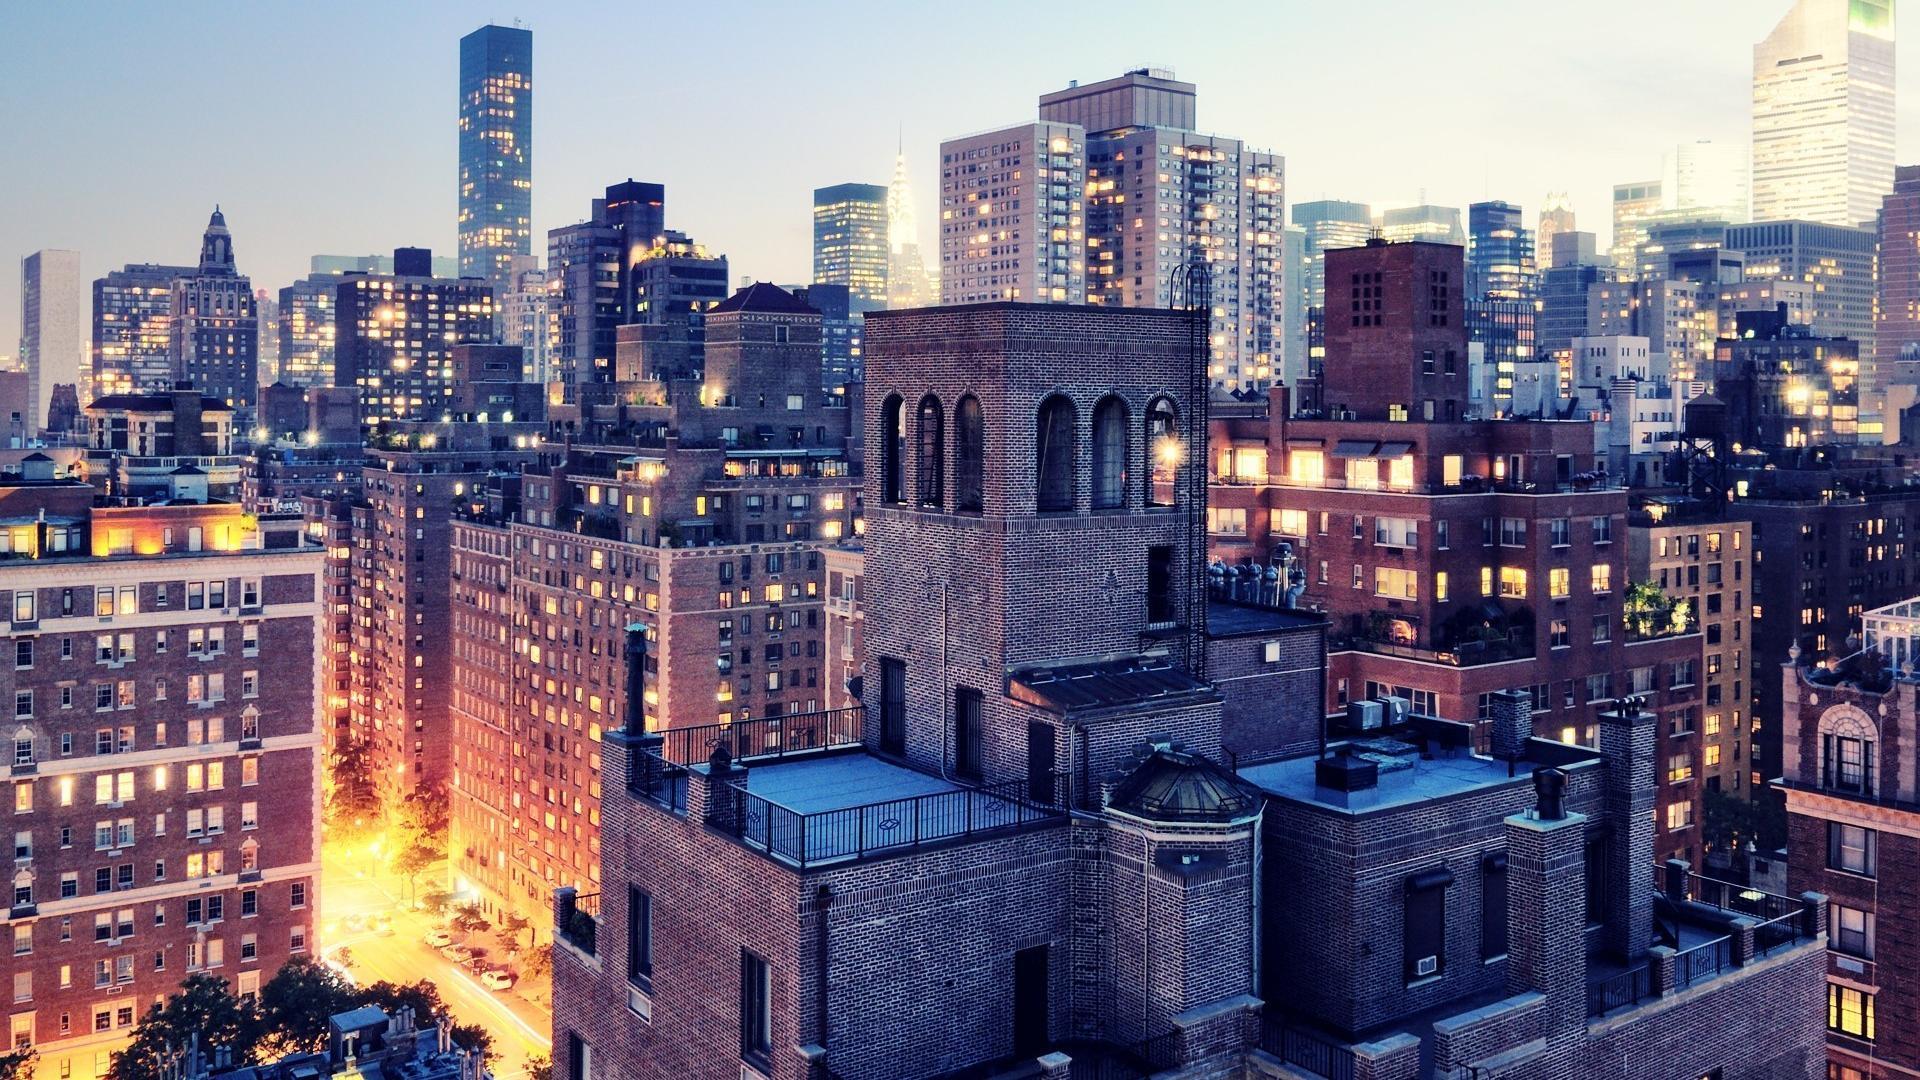 Inter Manhattan Street HD Wallpaper Background Images 1920x1080